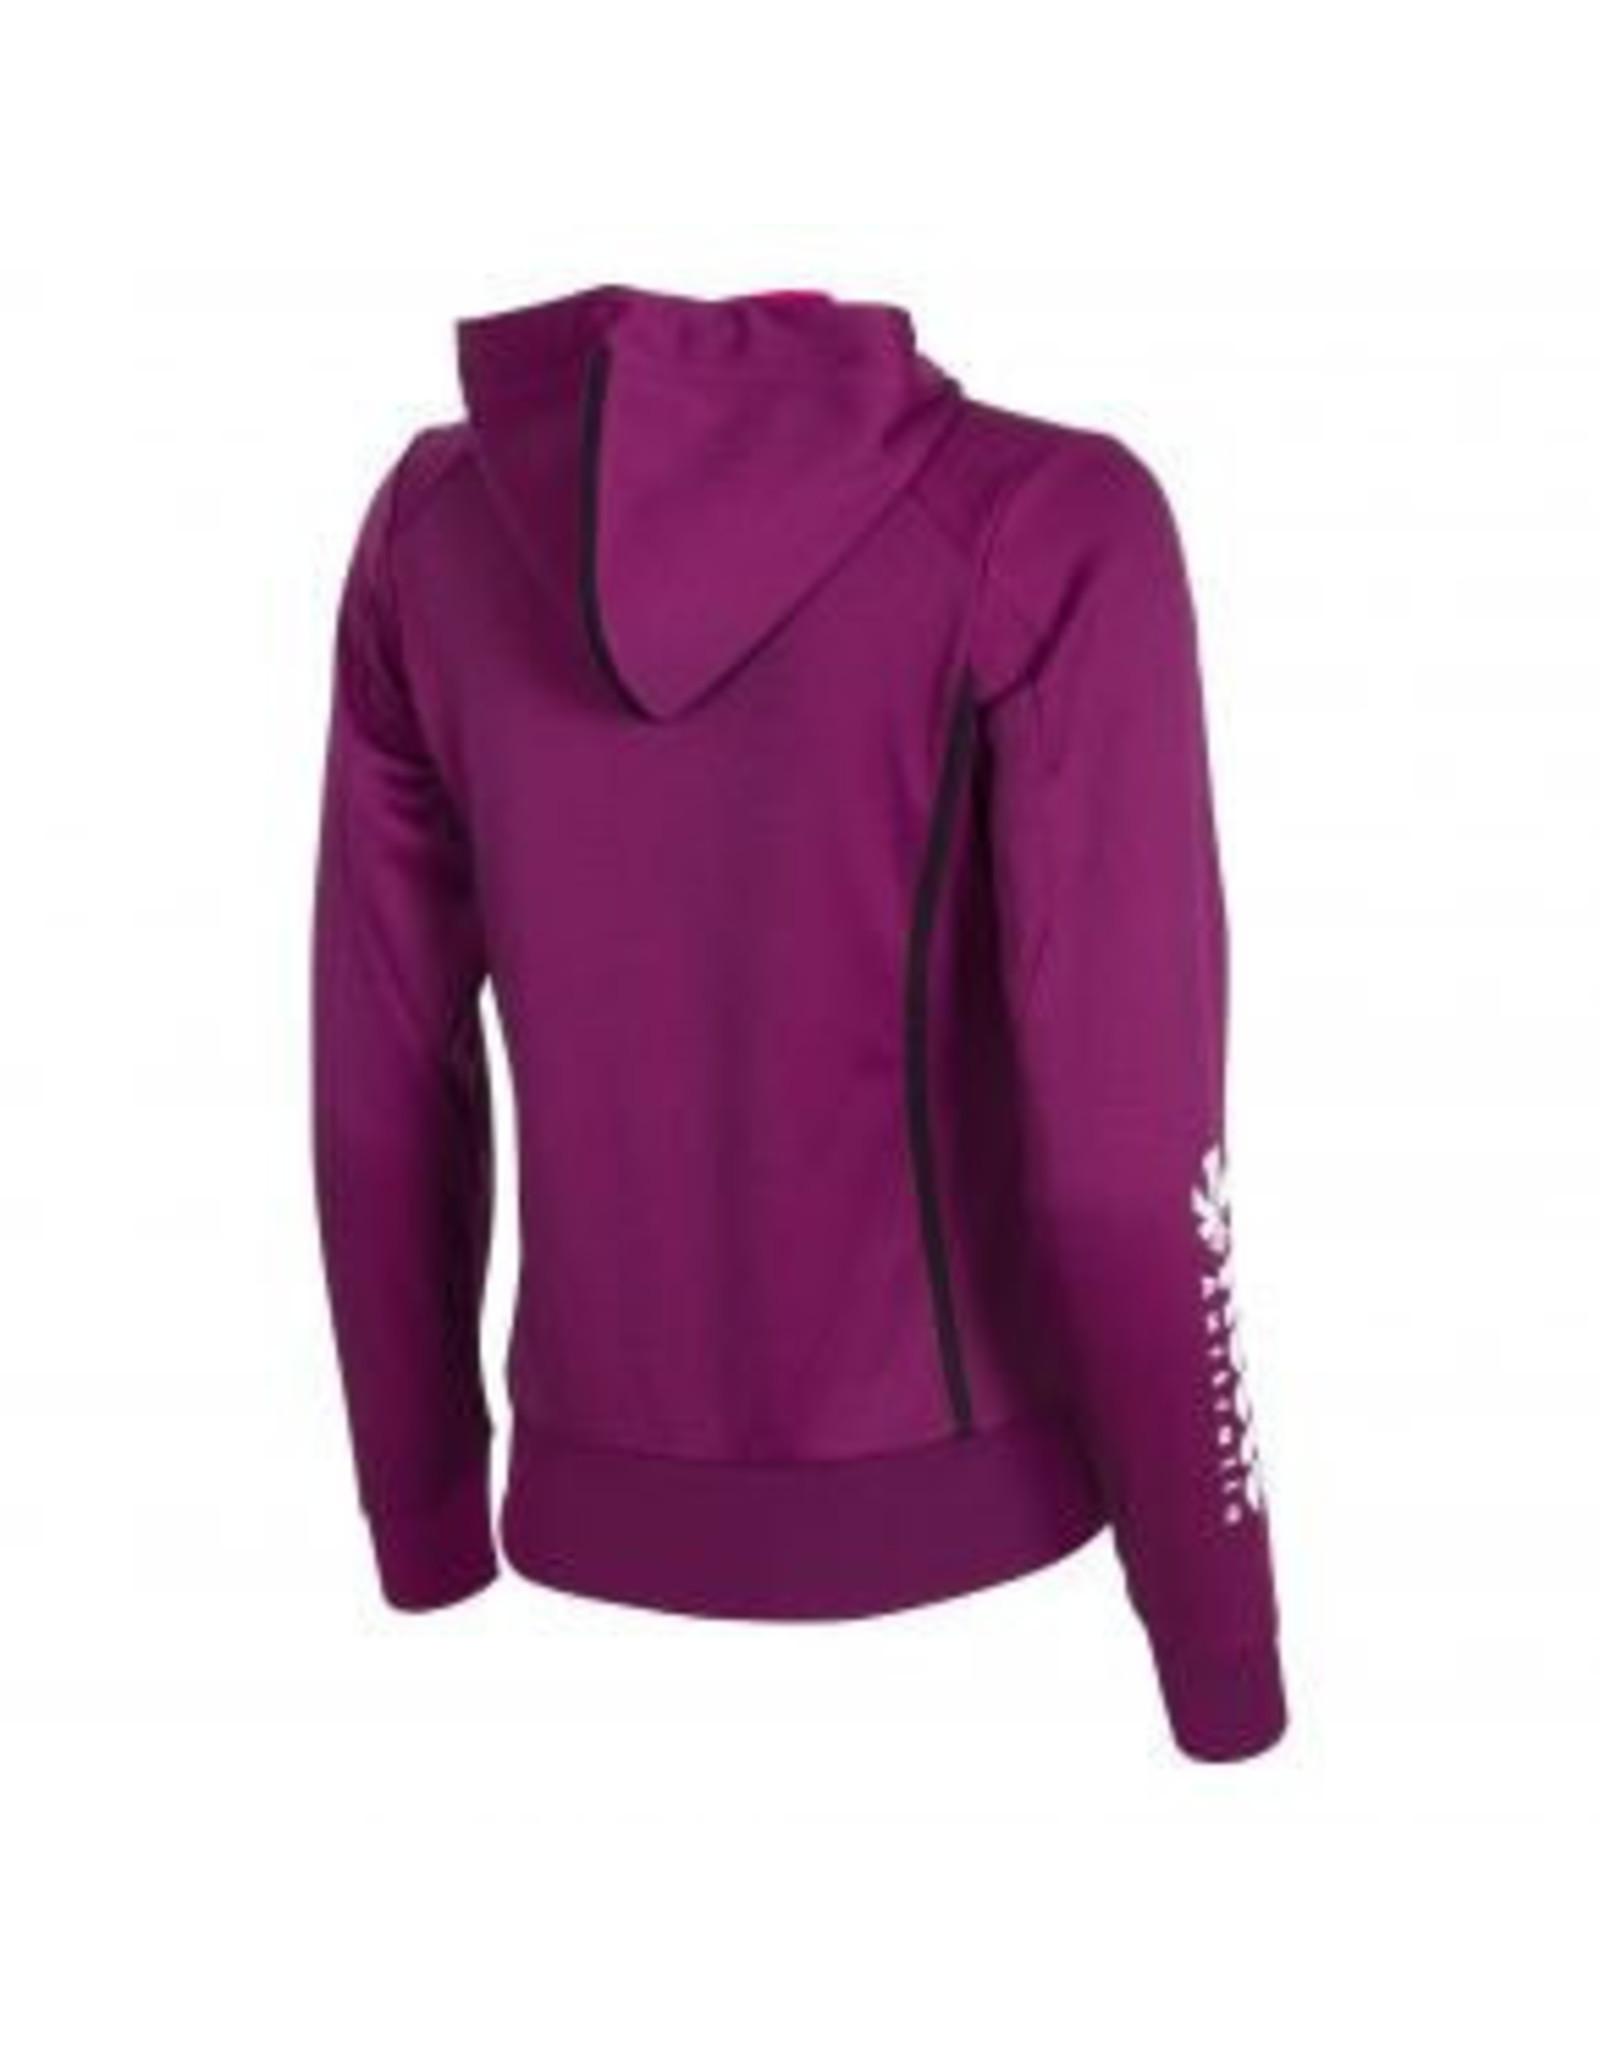 Reece Core TTS Hooded FZ Ladies Special